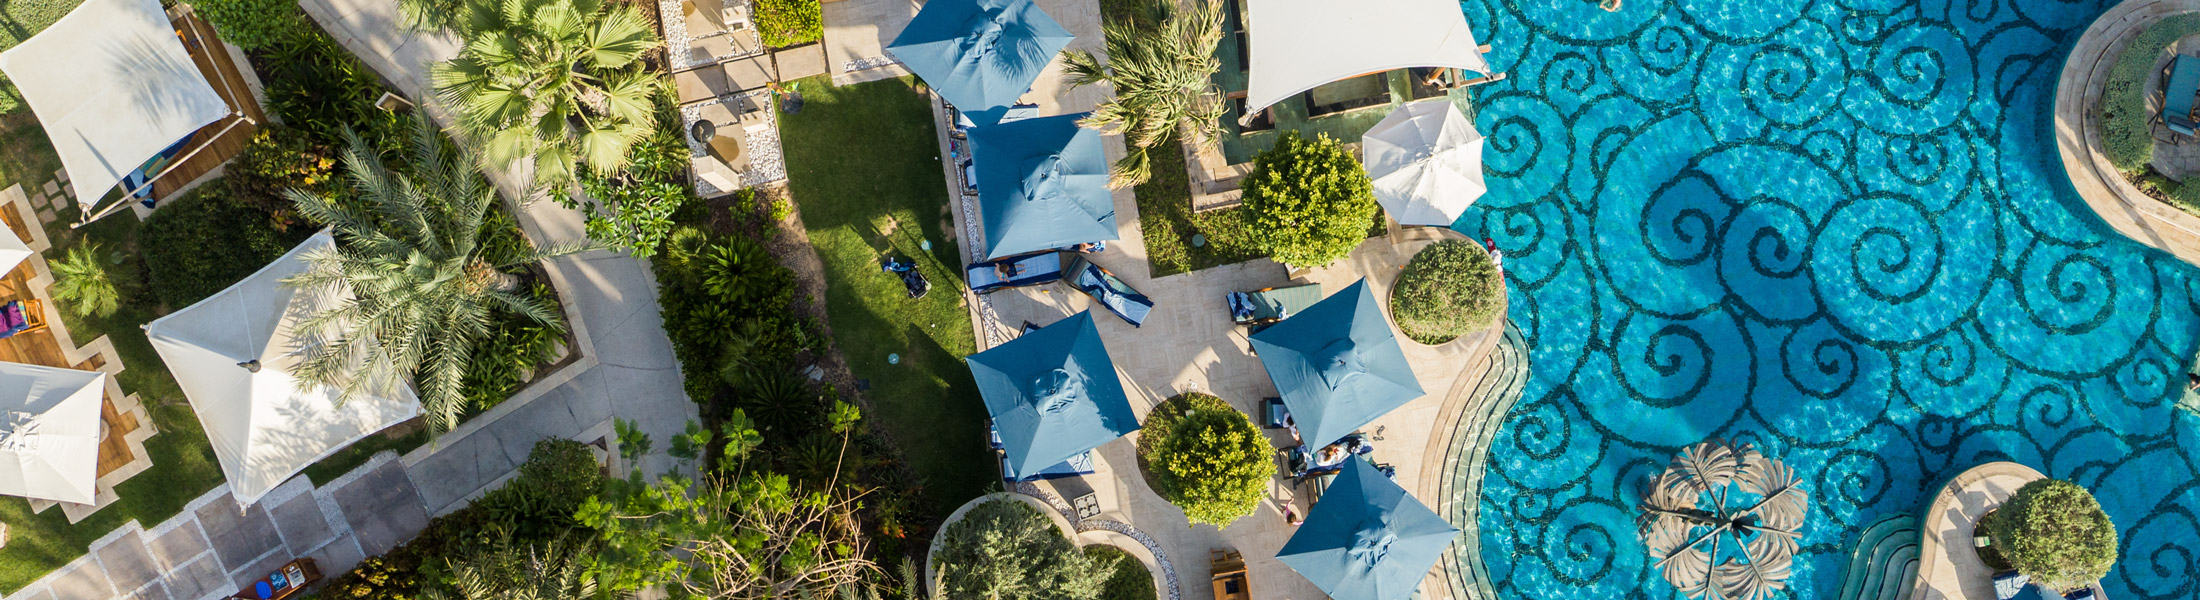 Adults Pool at the Jumeirah Al Naseem